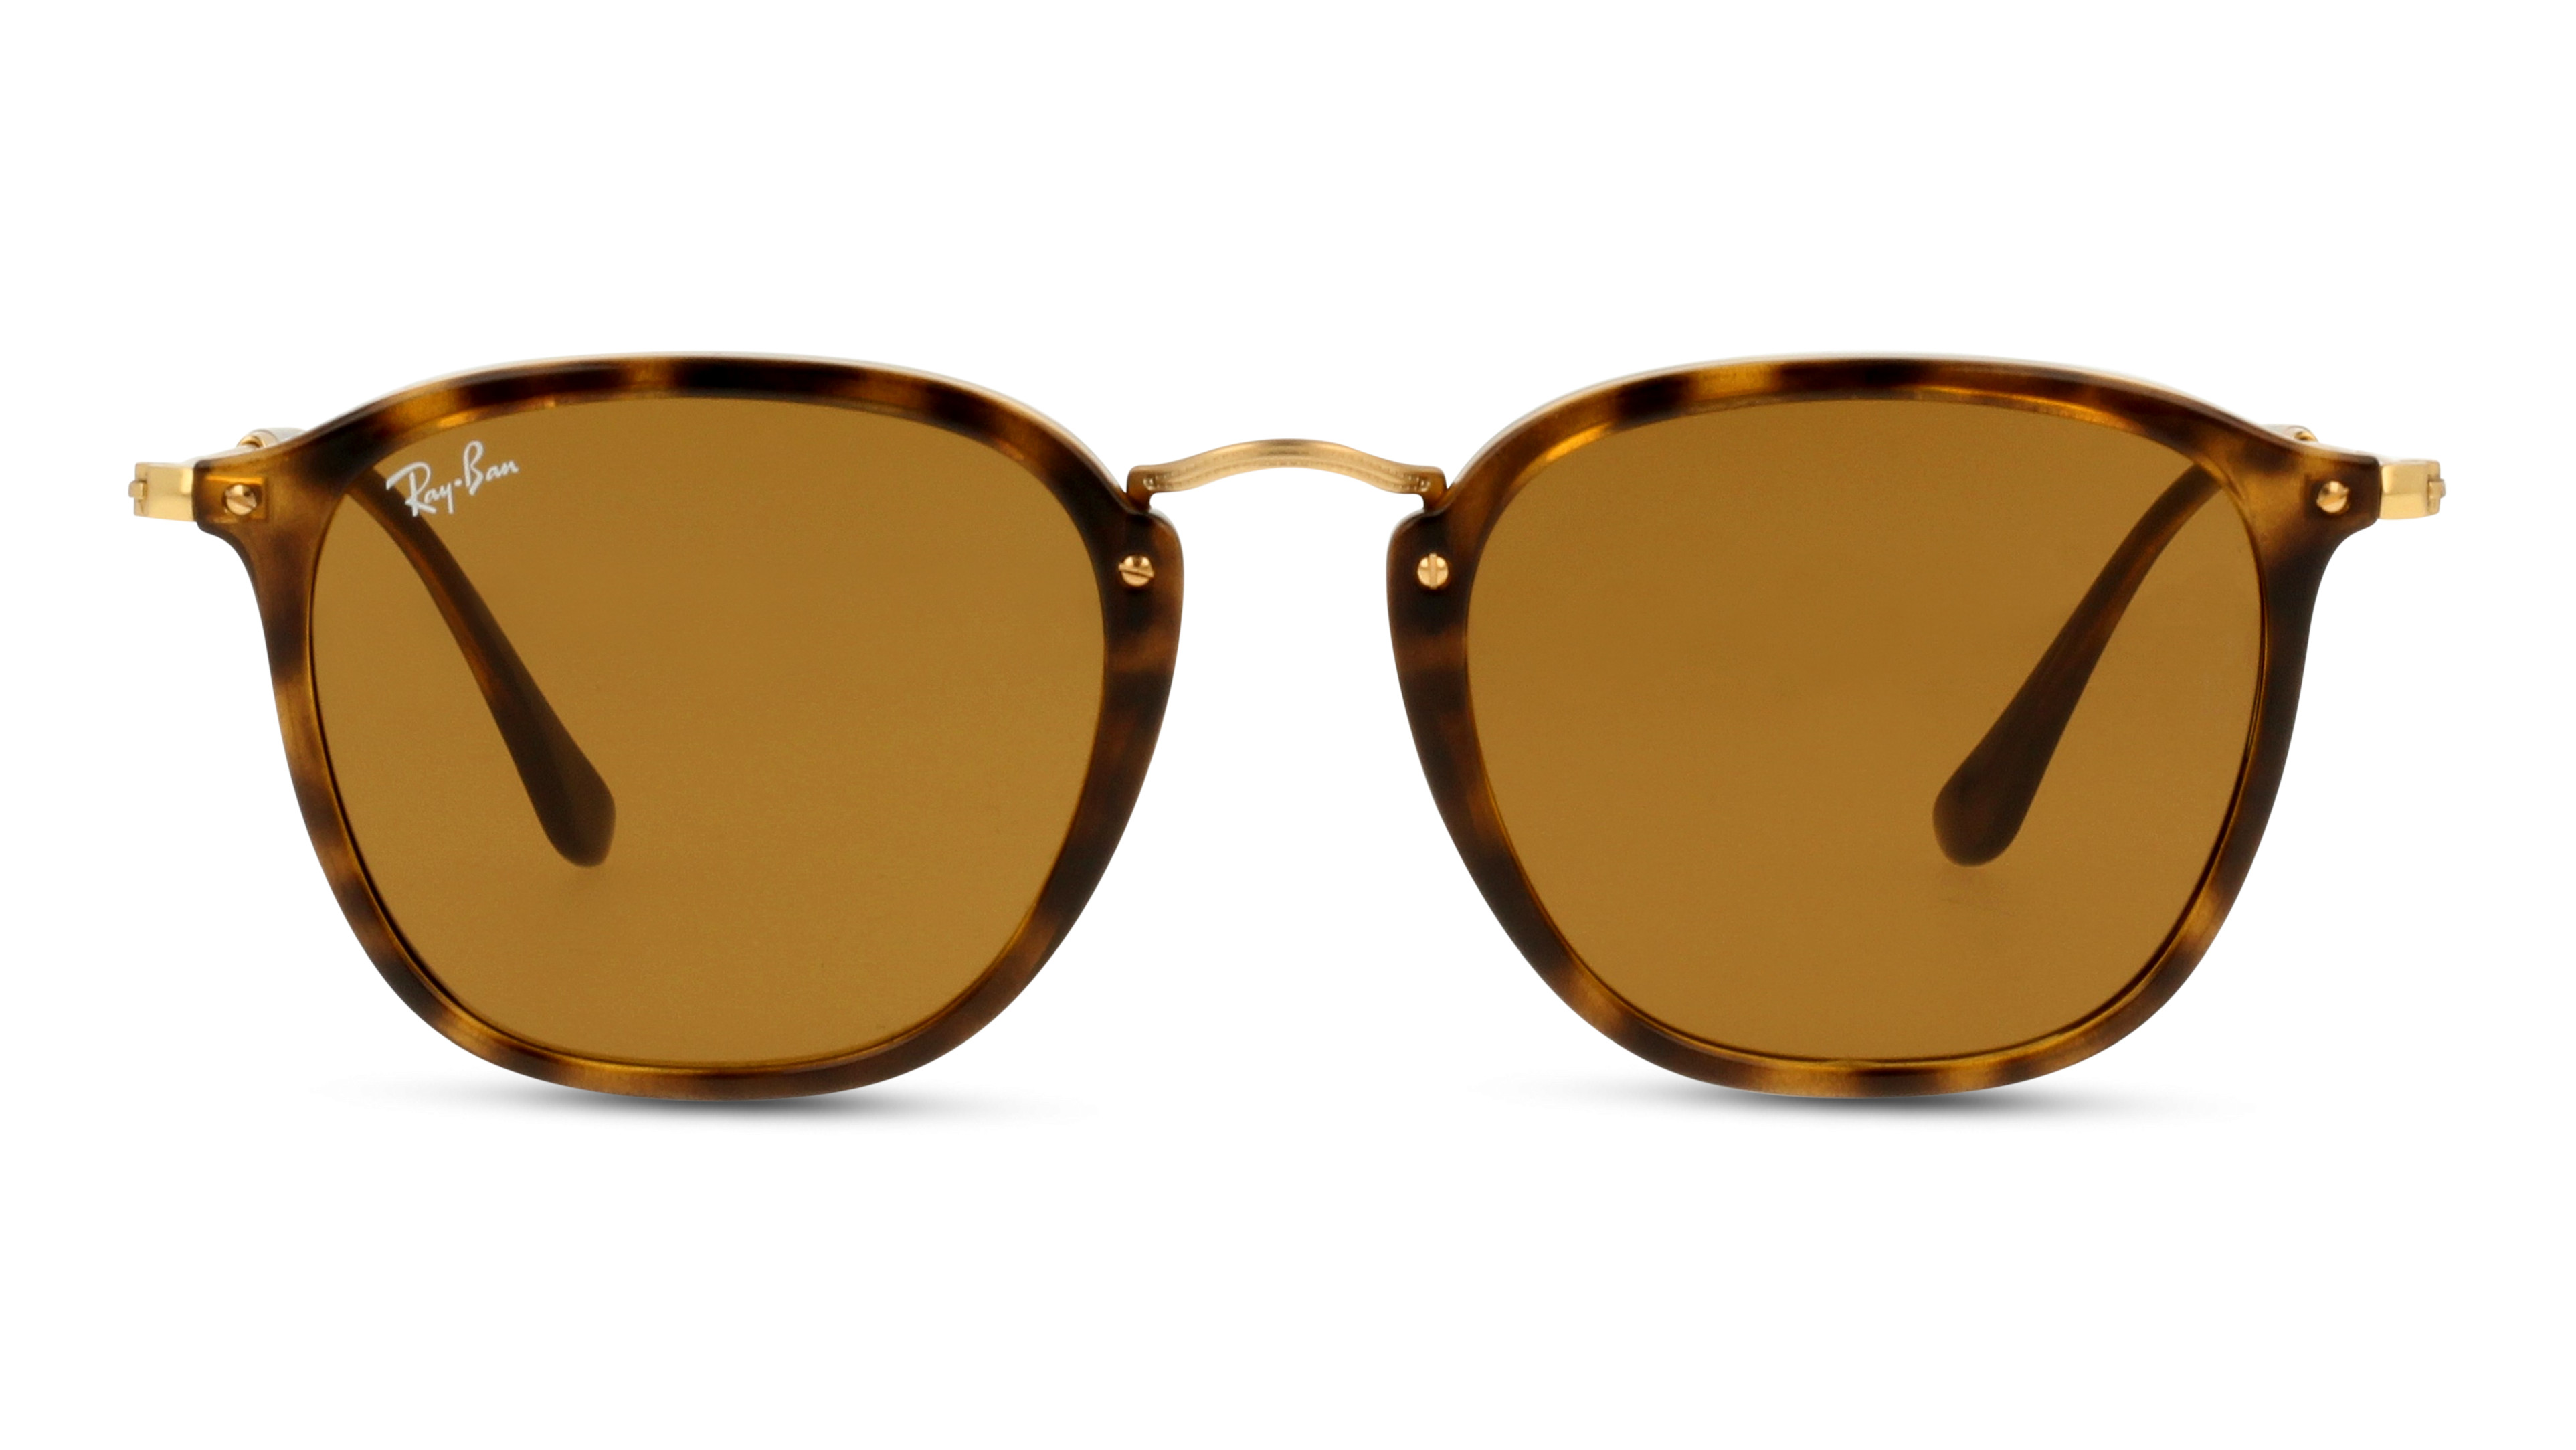 8053672672237-front-01-rayban-rb2448n-eyewear-tortoise